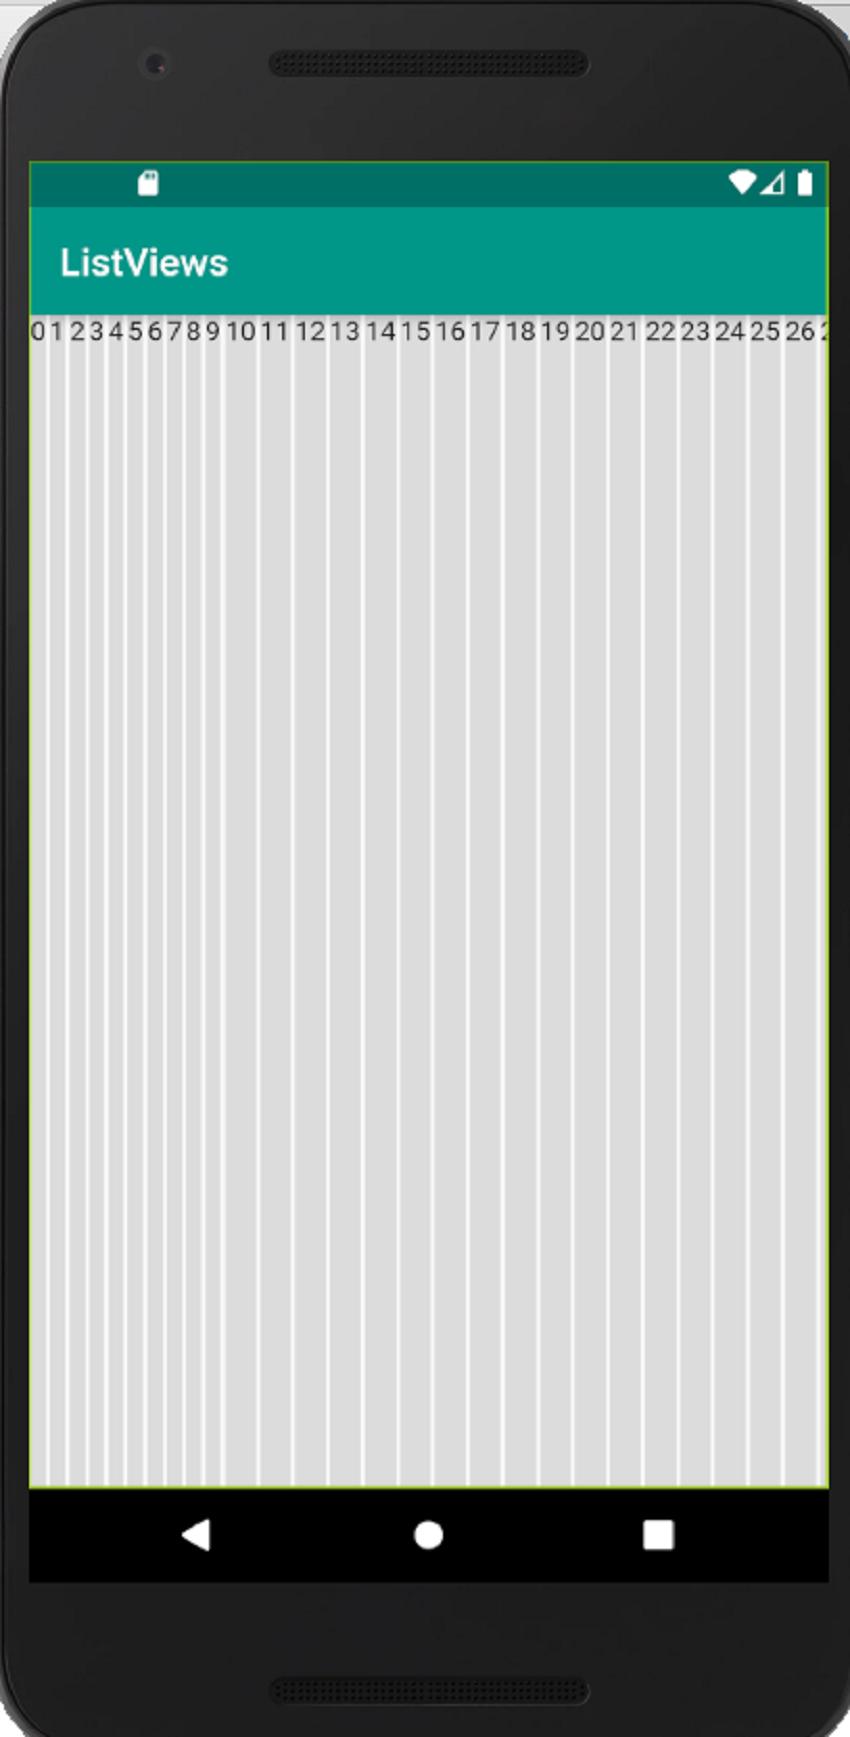 horizontal list